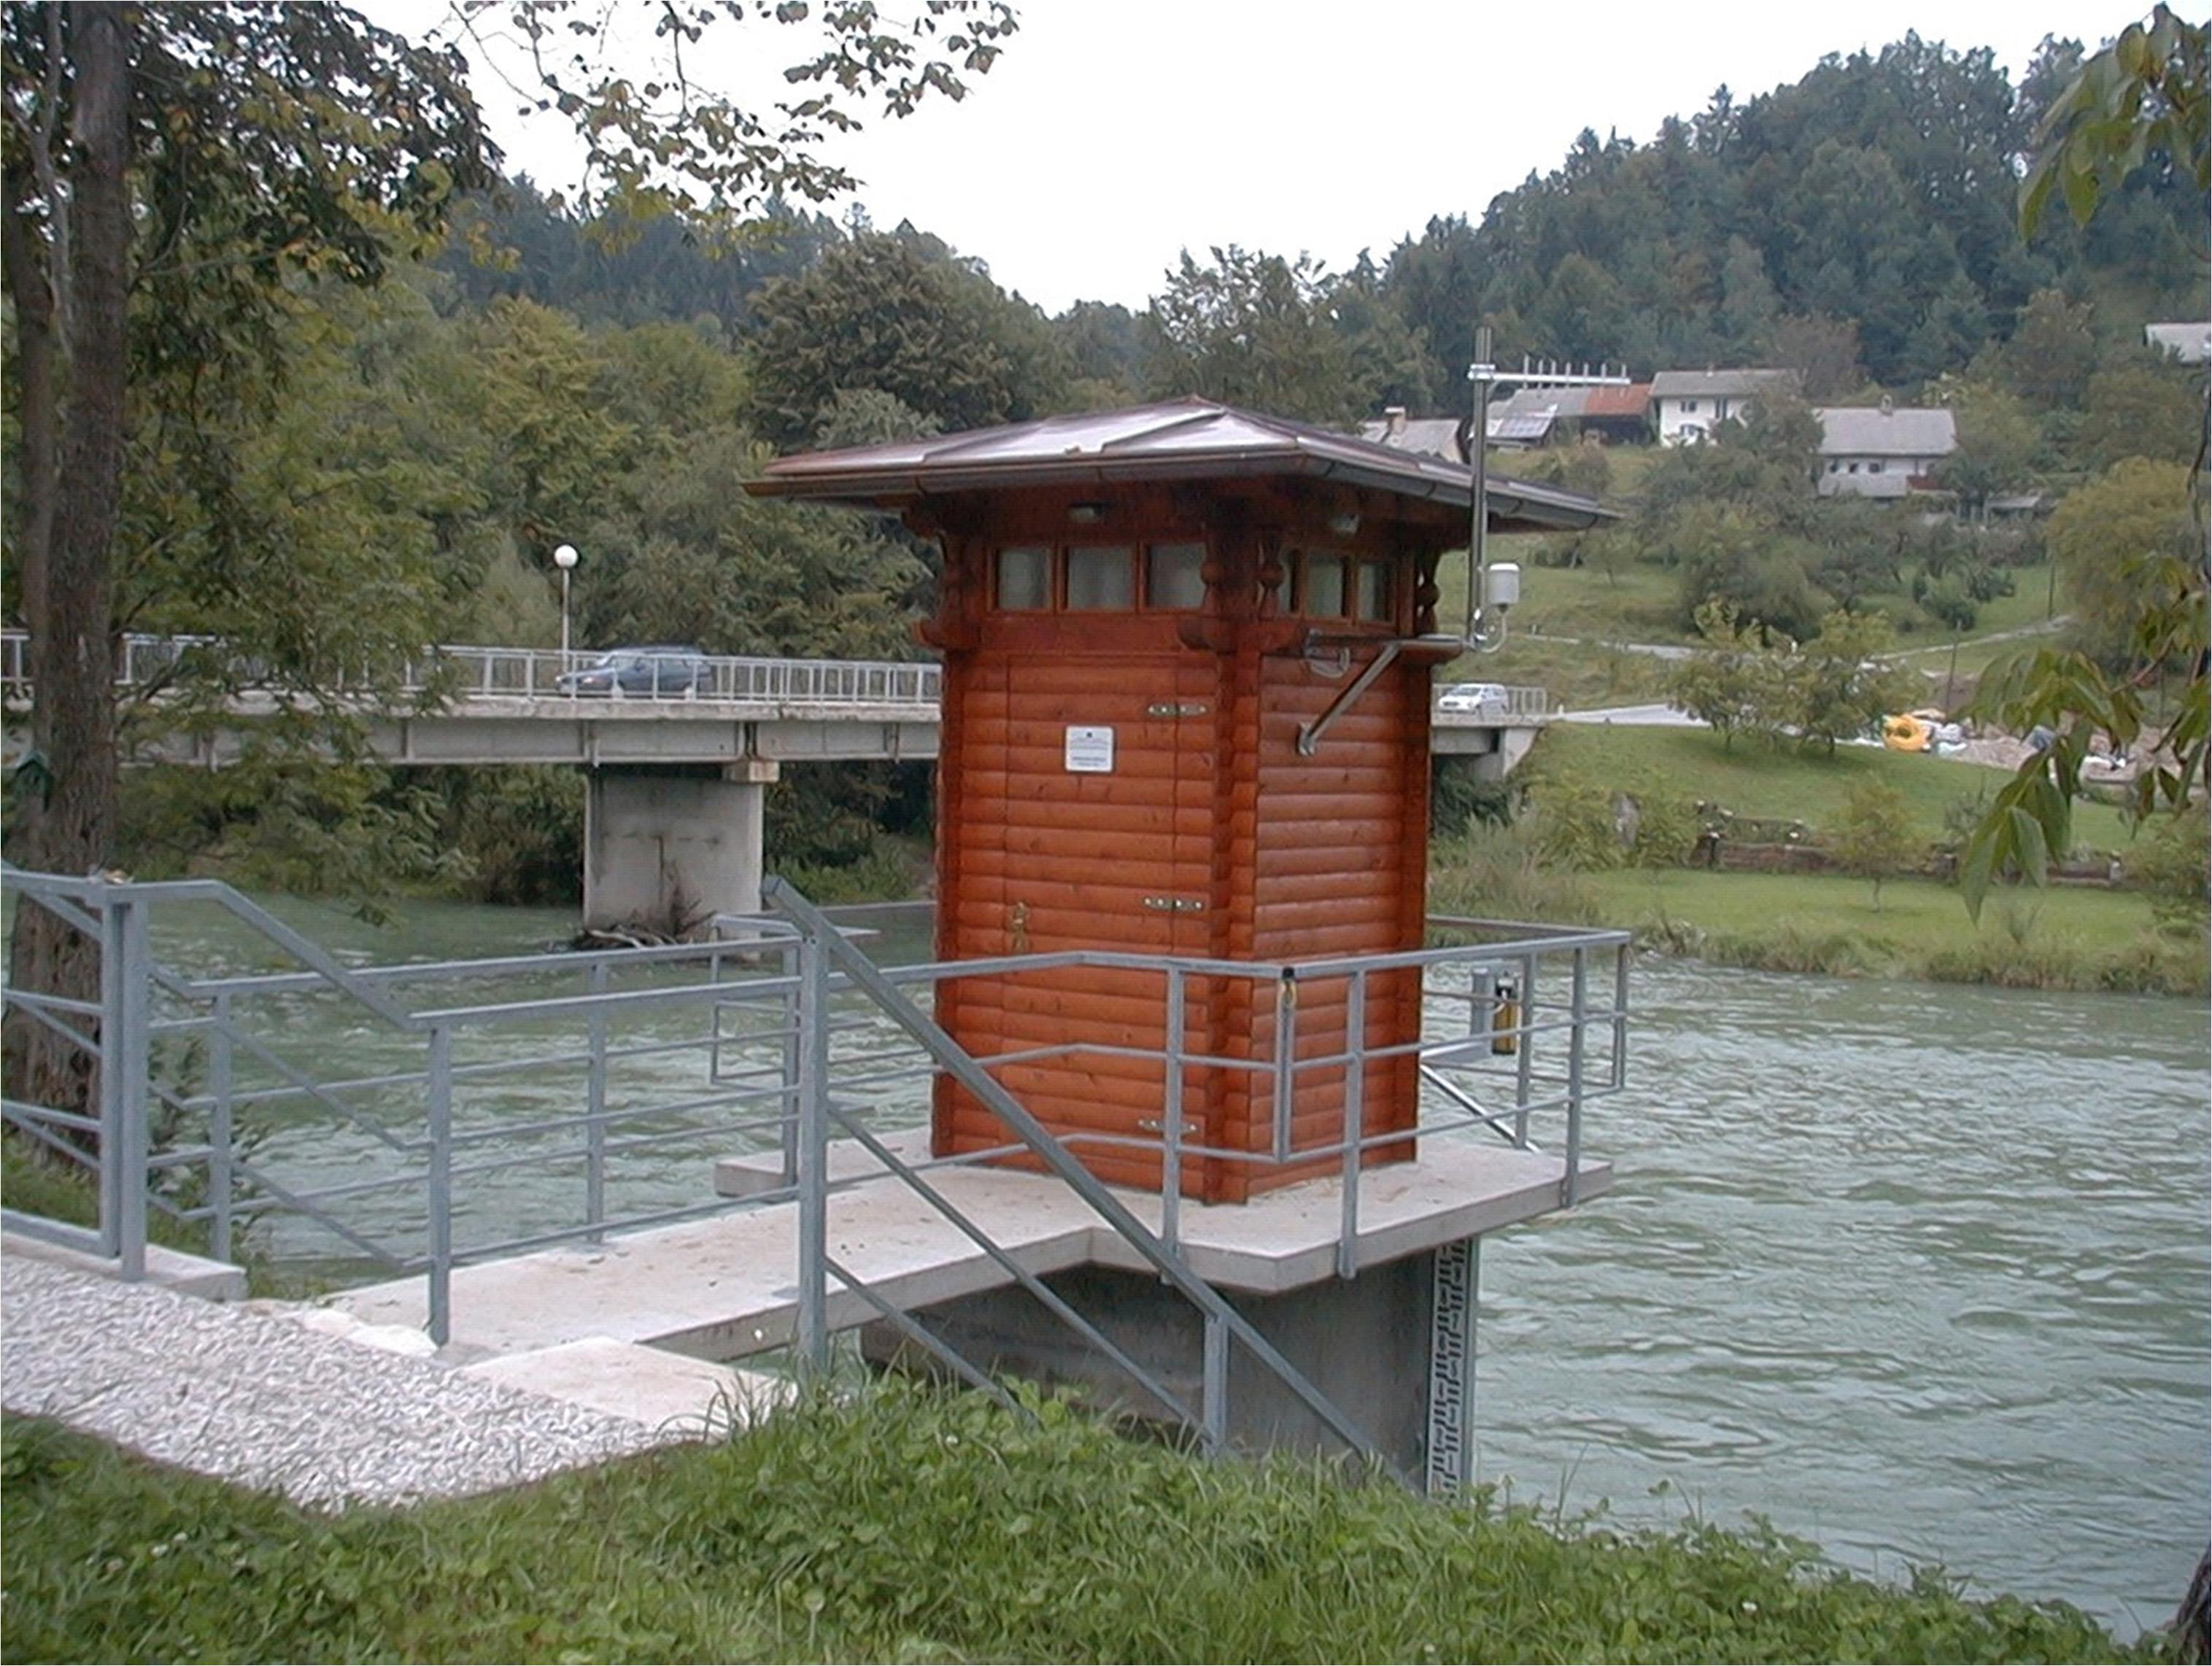 Gauging station Radovljica on the Sava River in Slovenia. Photo: Internatonal Sava River Basin Commission